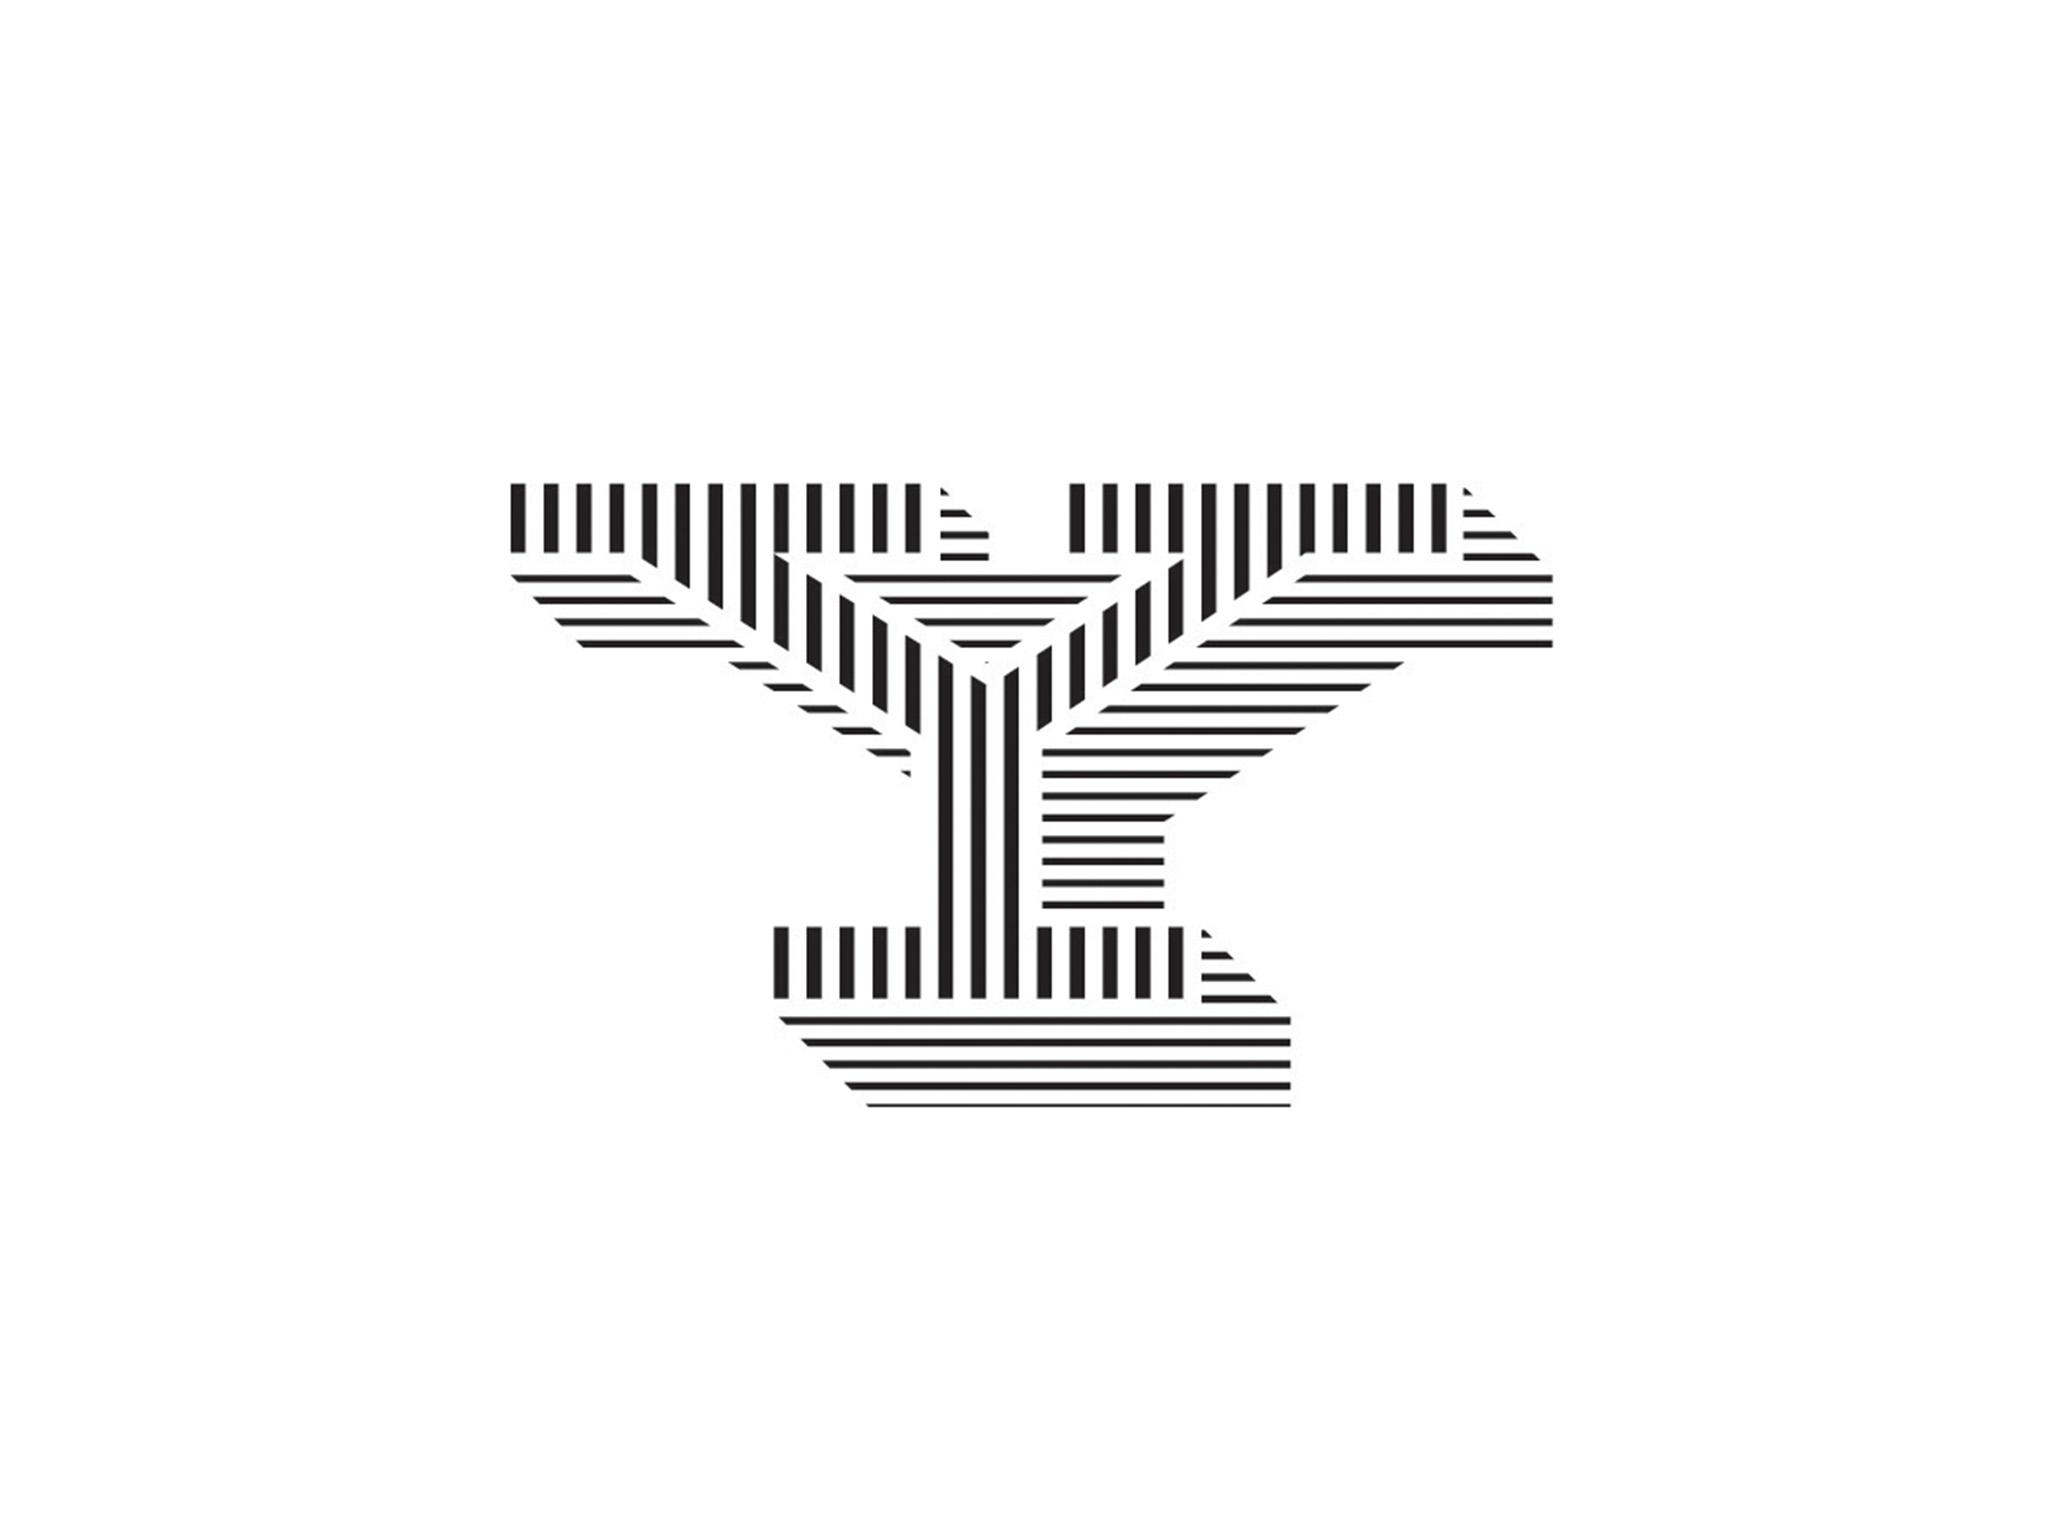 apex_letters_horizontal_large_0031_2_final_alphabet coasters-25.jpg